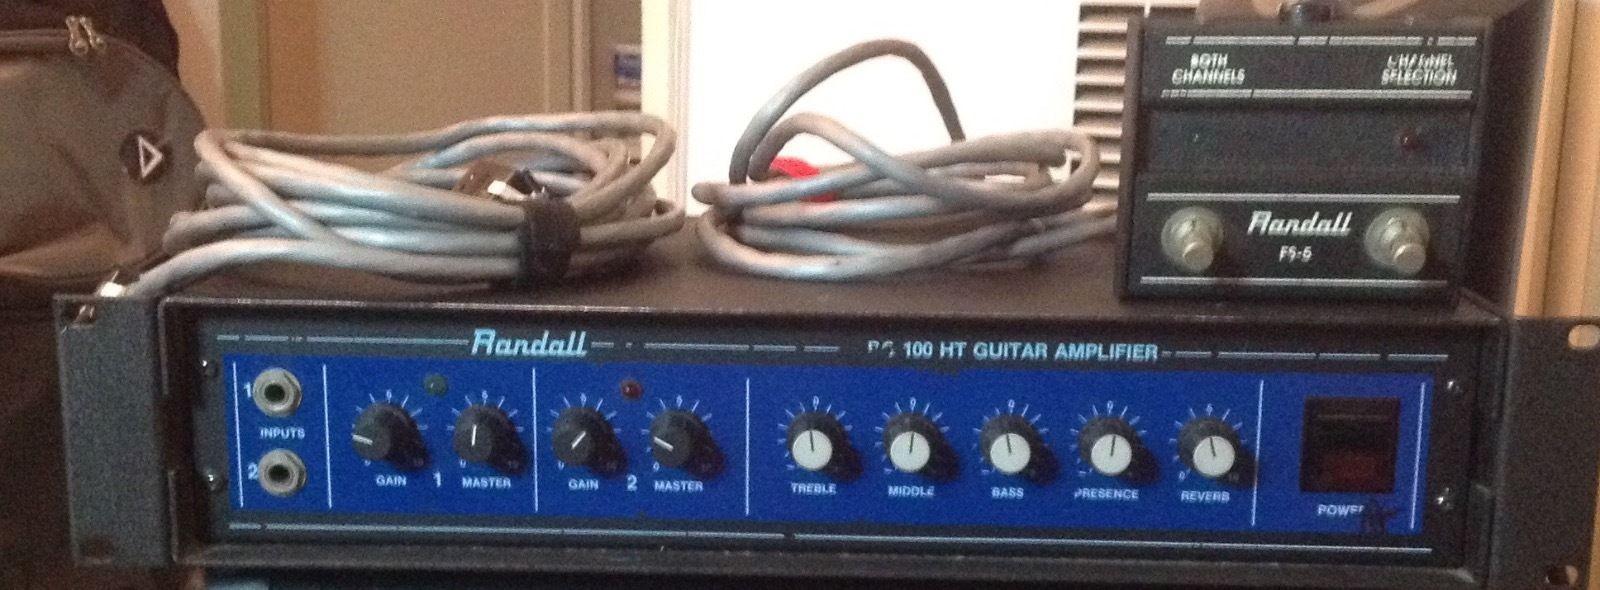 Randall Rg 100 Ht Average Used Price Audiofanzine border=